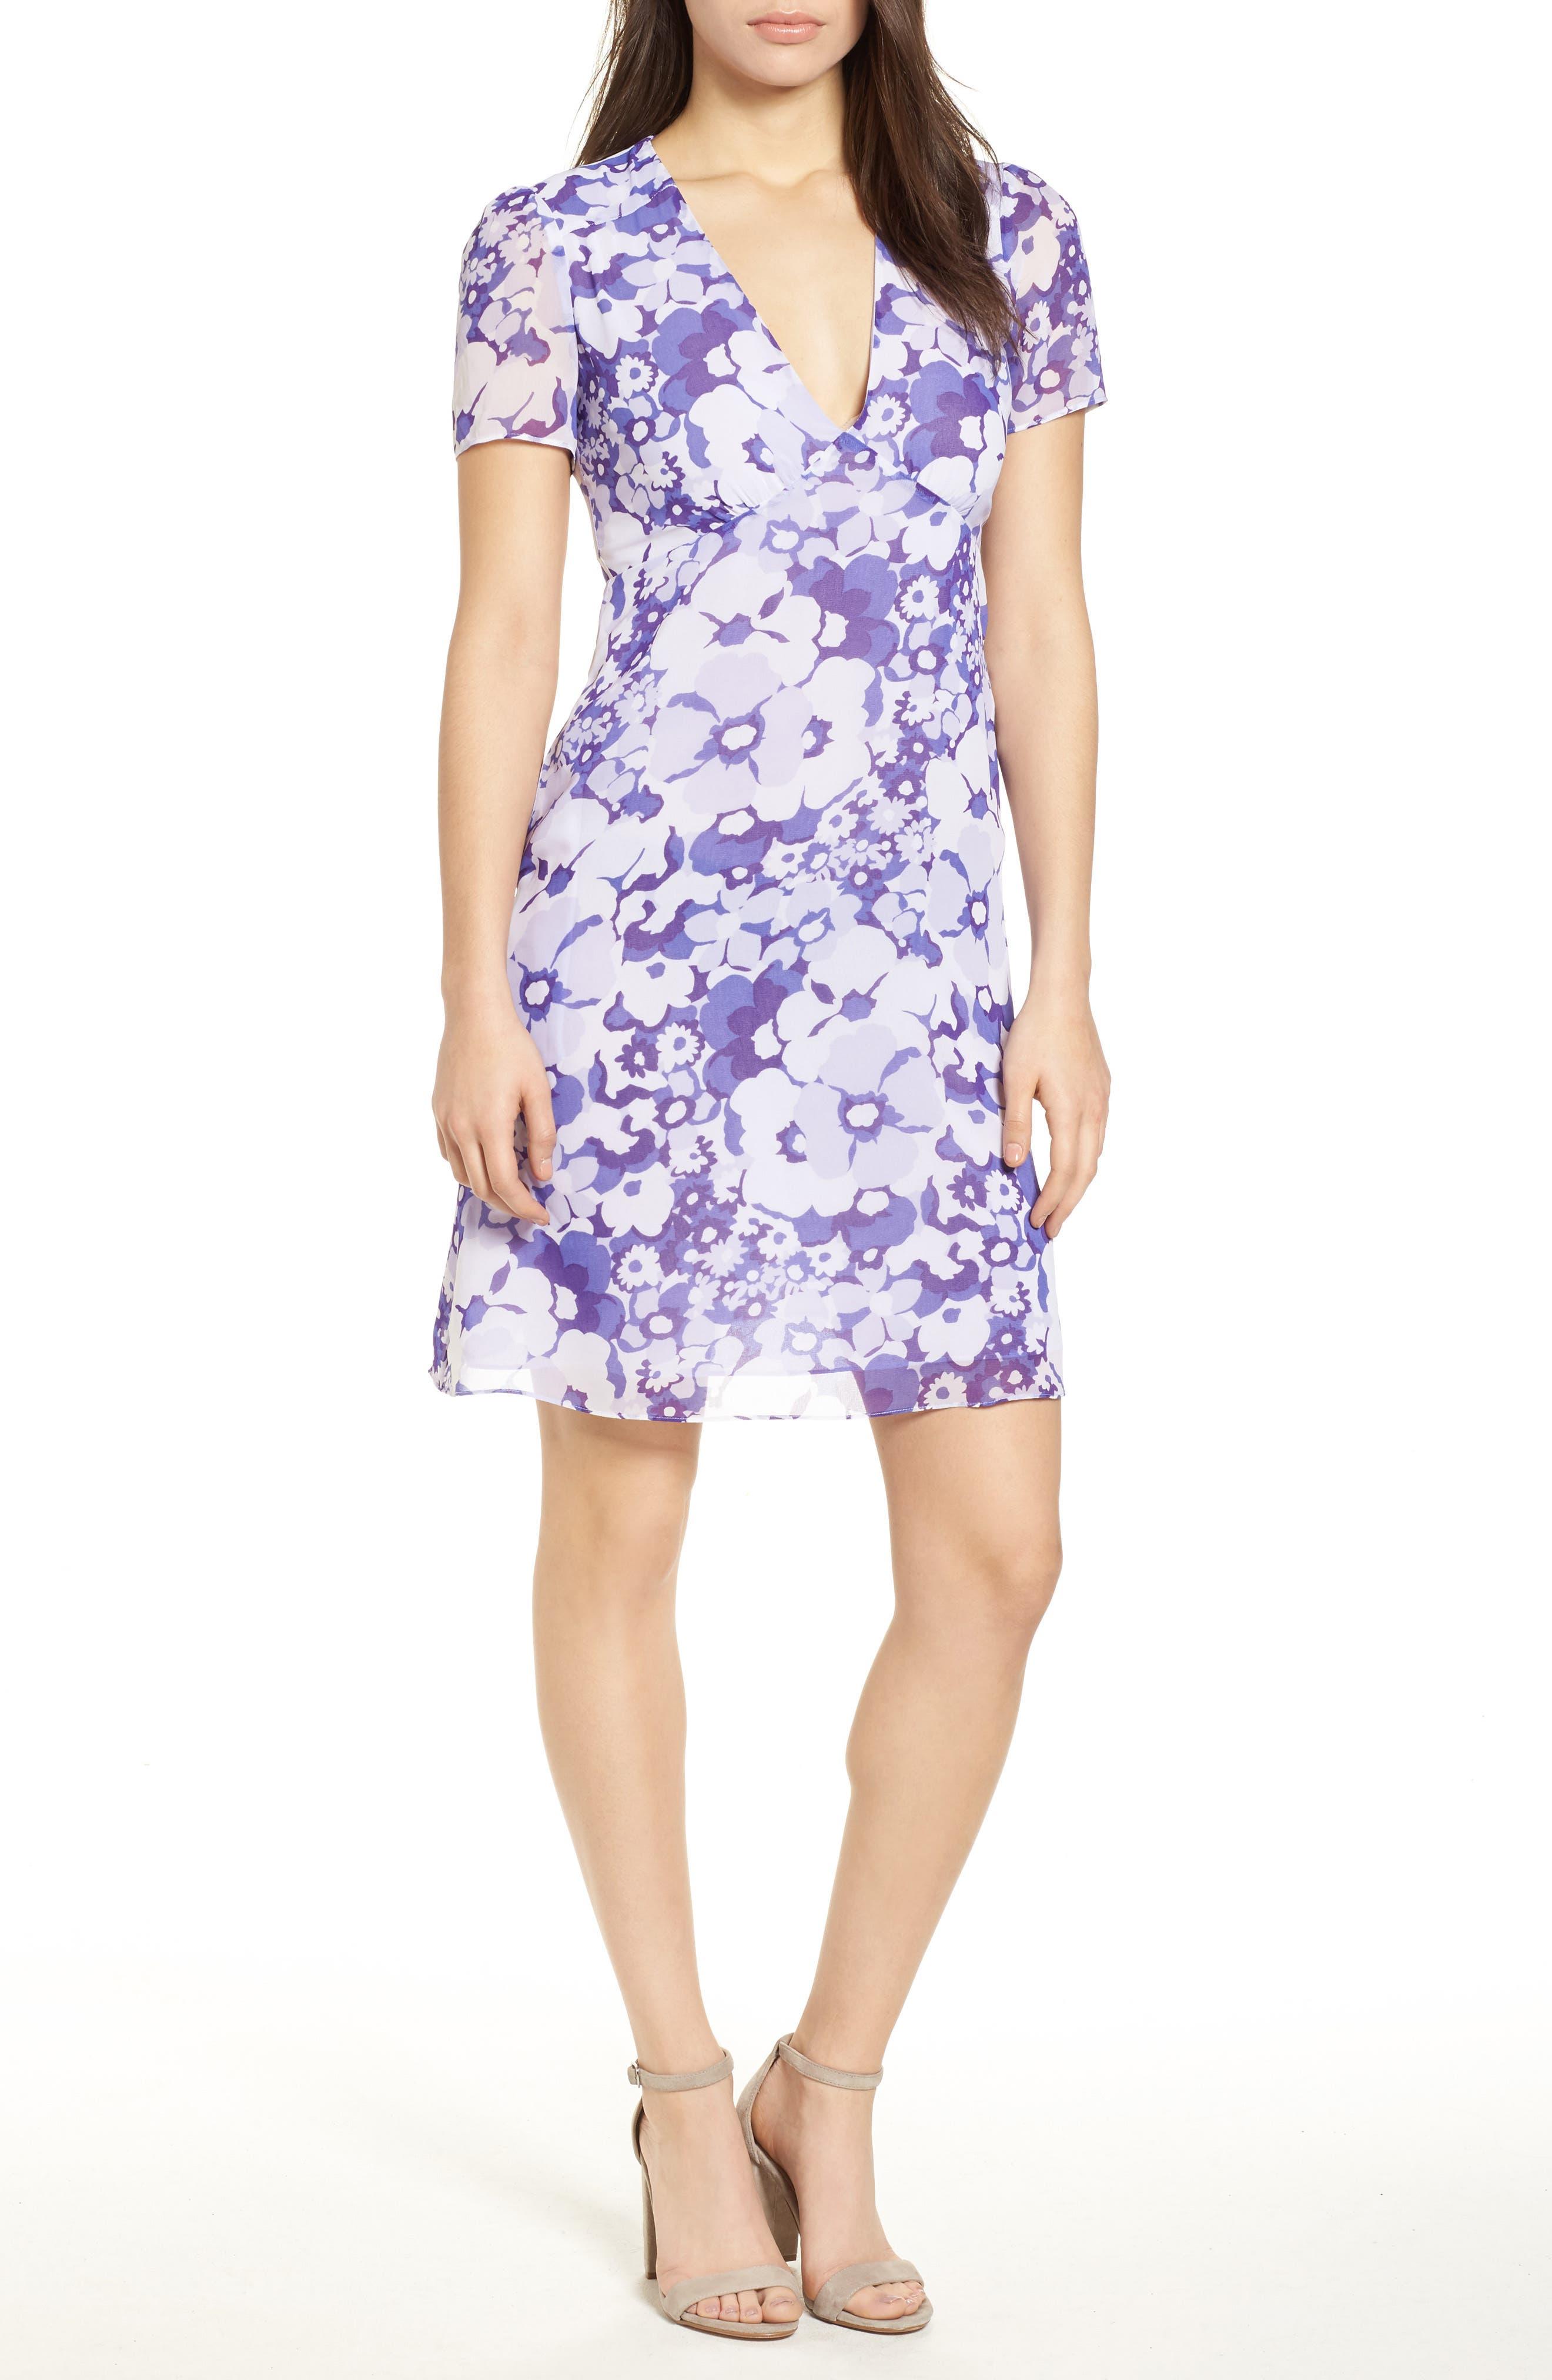 Springtime Floral Dress,                         Main,                         color, 580